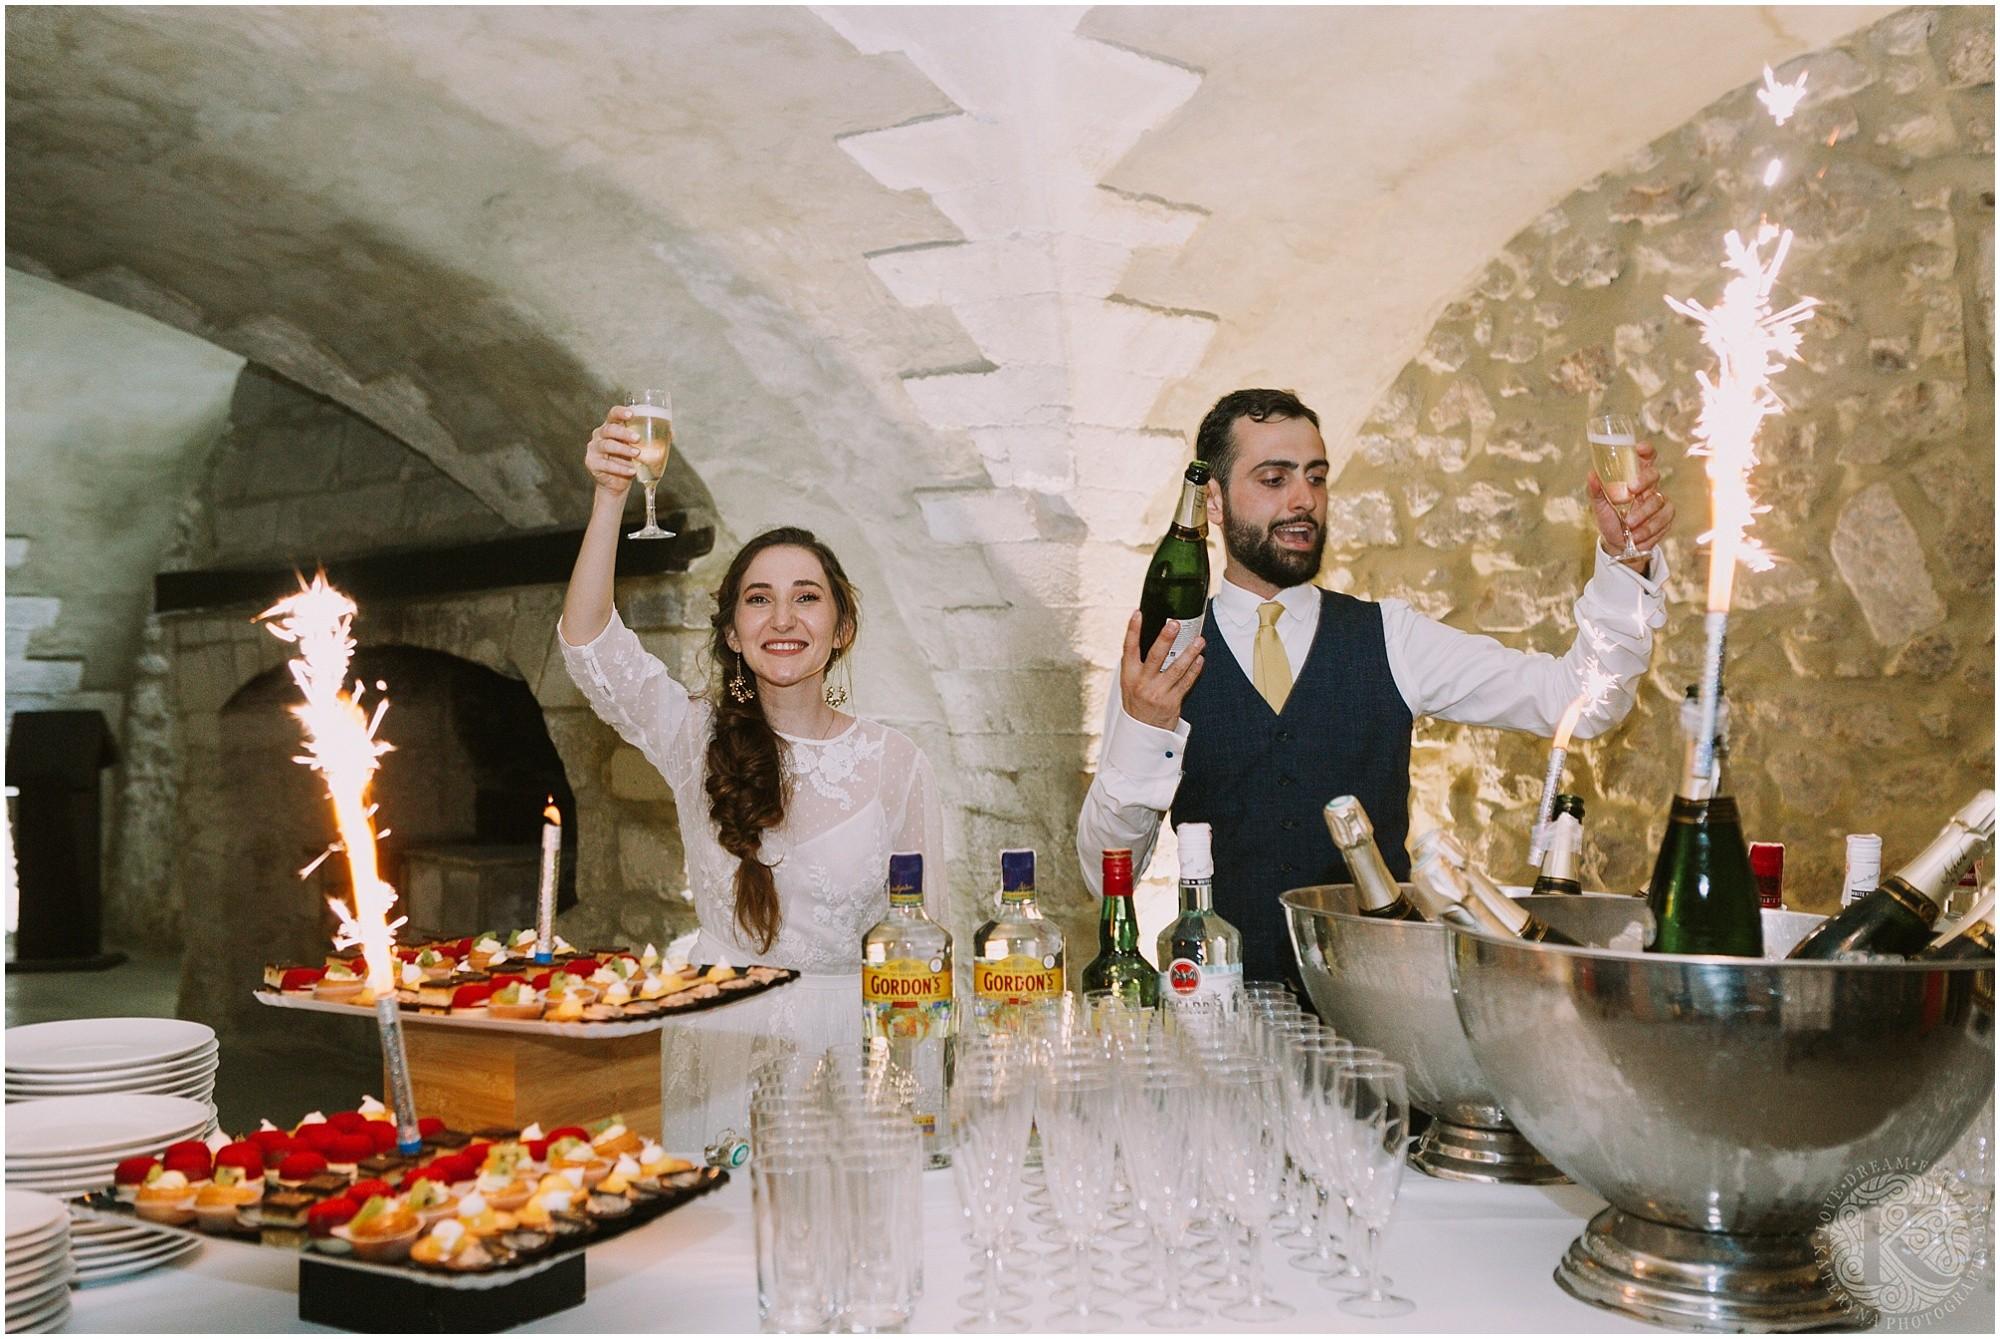 Kateryna-photos-photographe-mariage-vaucluse-provence-avignon-ferme-st-hugues_0097.jpg